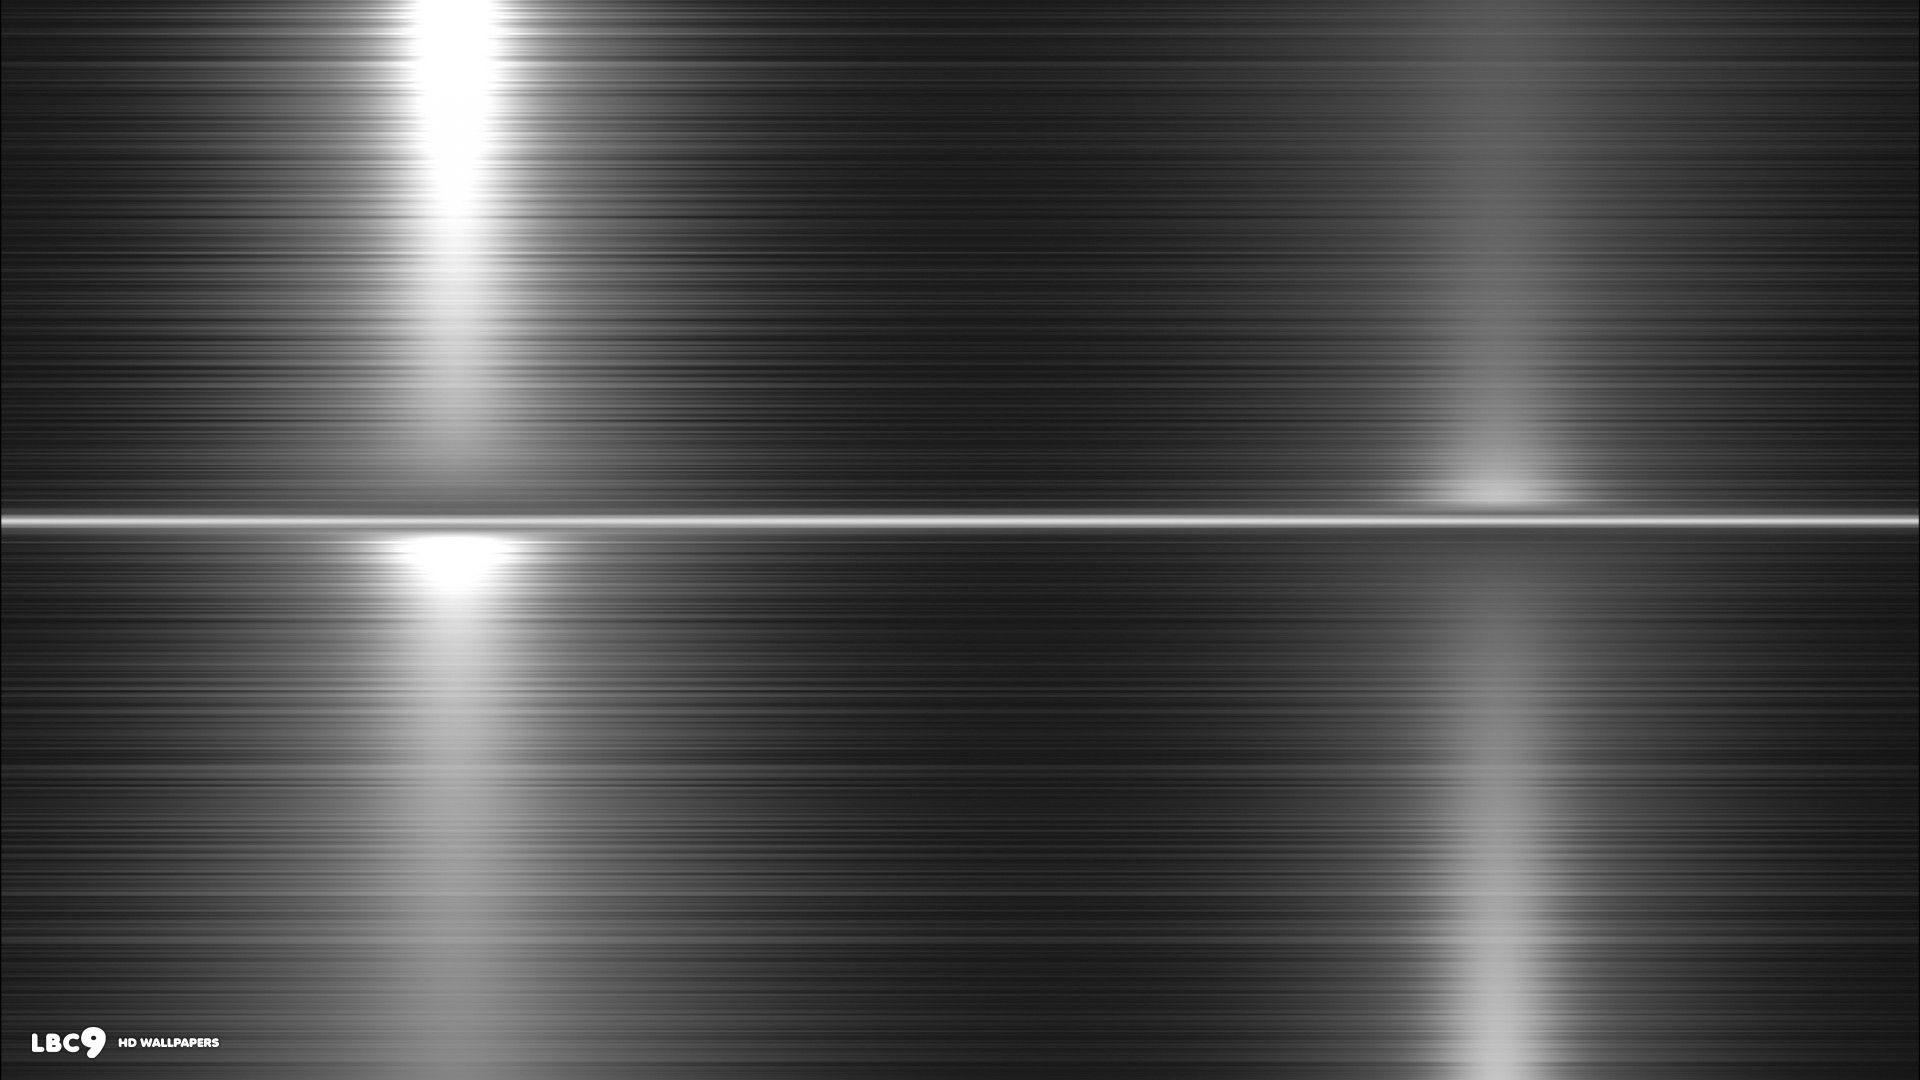 Black Silver HD Wallpaper